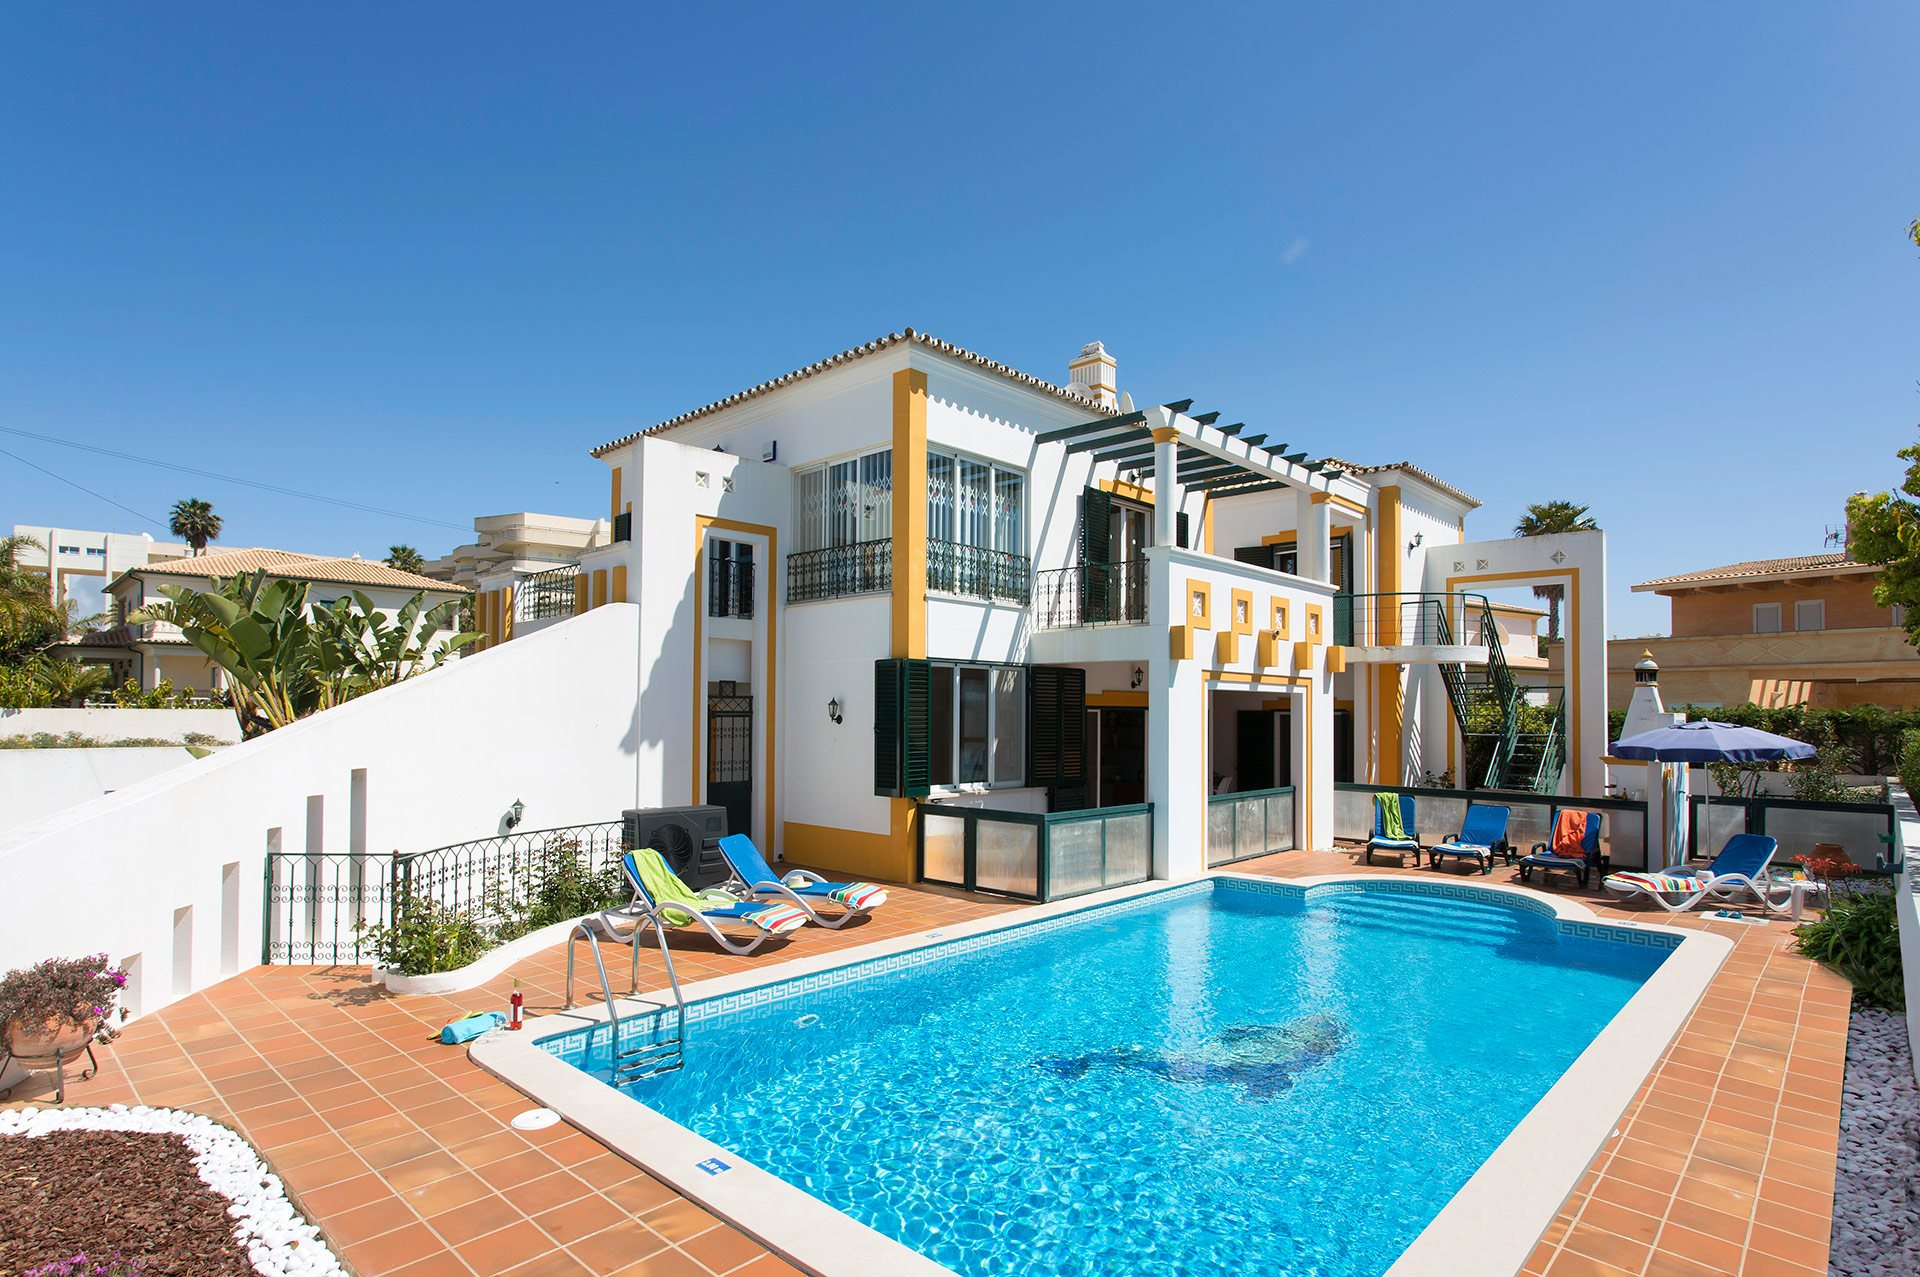 Villa Dona Branca, Gale, Algarve, Portugal